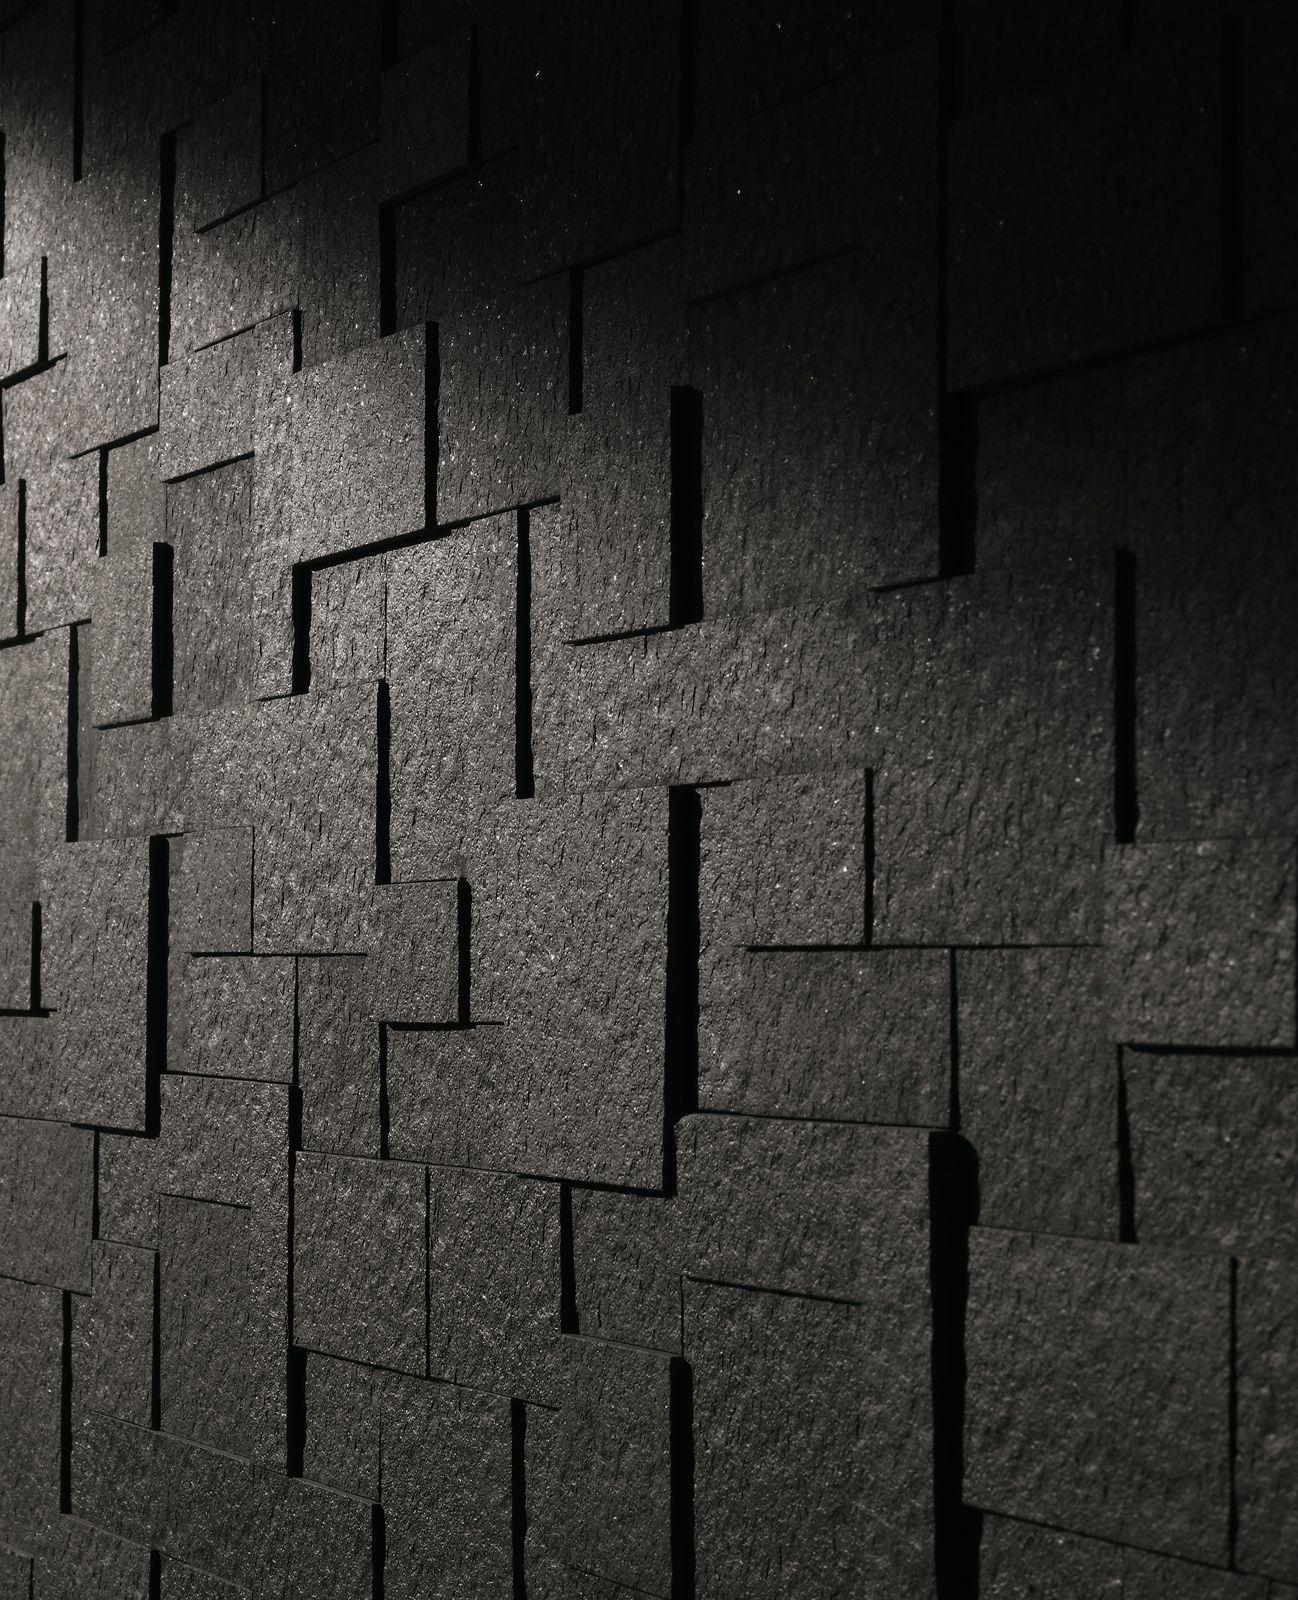 Propozycja pod prysznic 2 monolith ceramic tiles marazzi561 j propozycja pod prysznic 2 monolith ceramic tiles marazzi561 dailygadgetfo Images